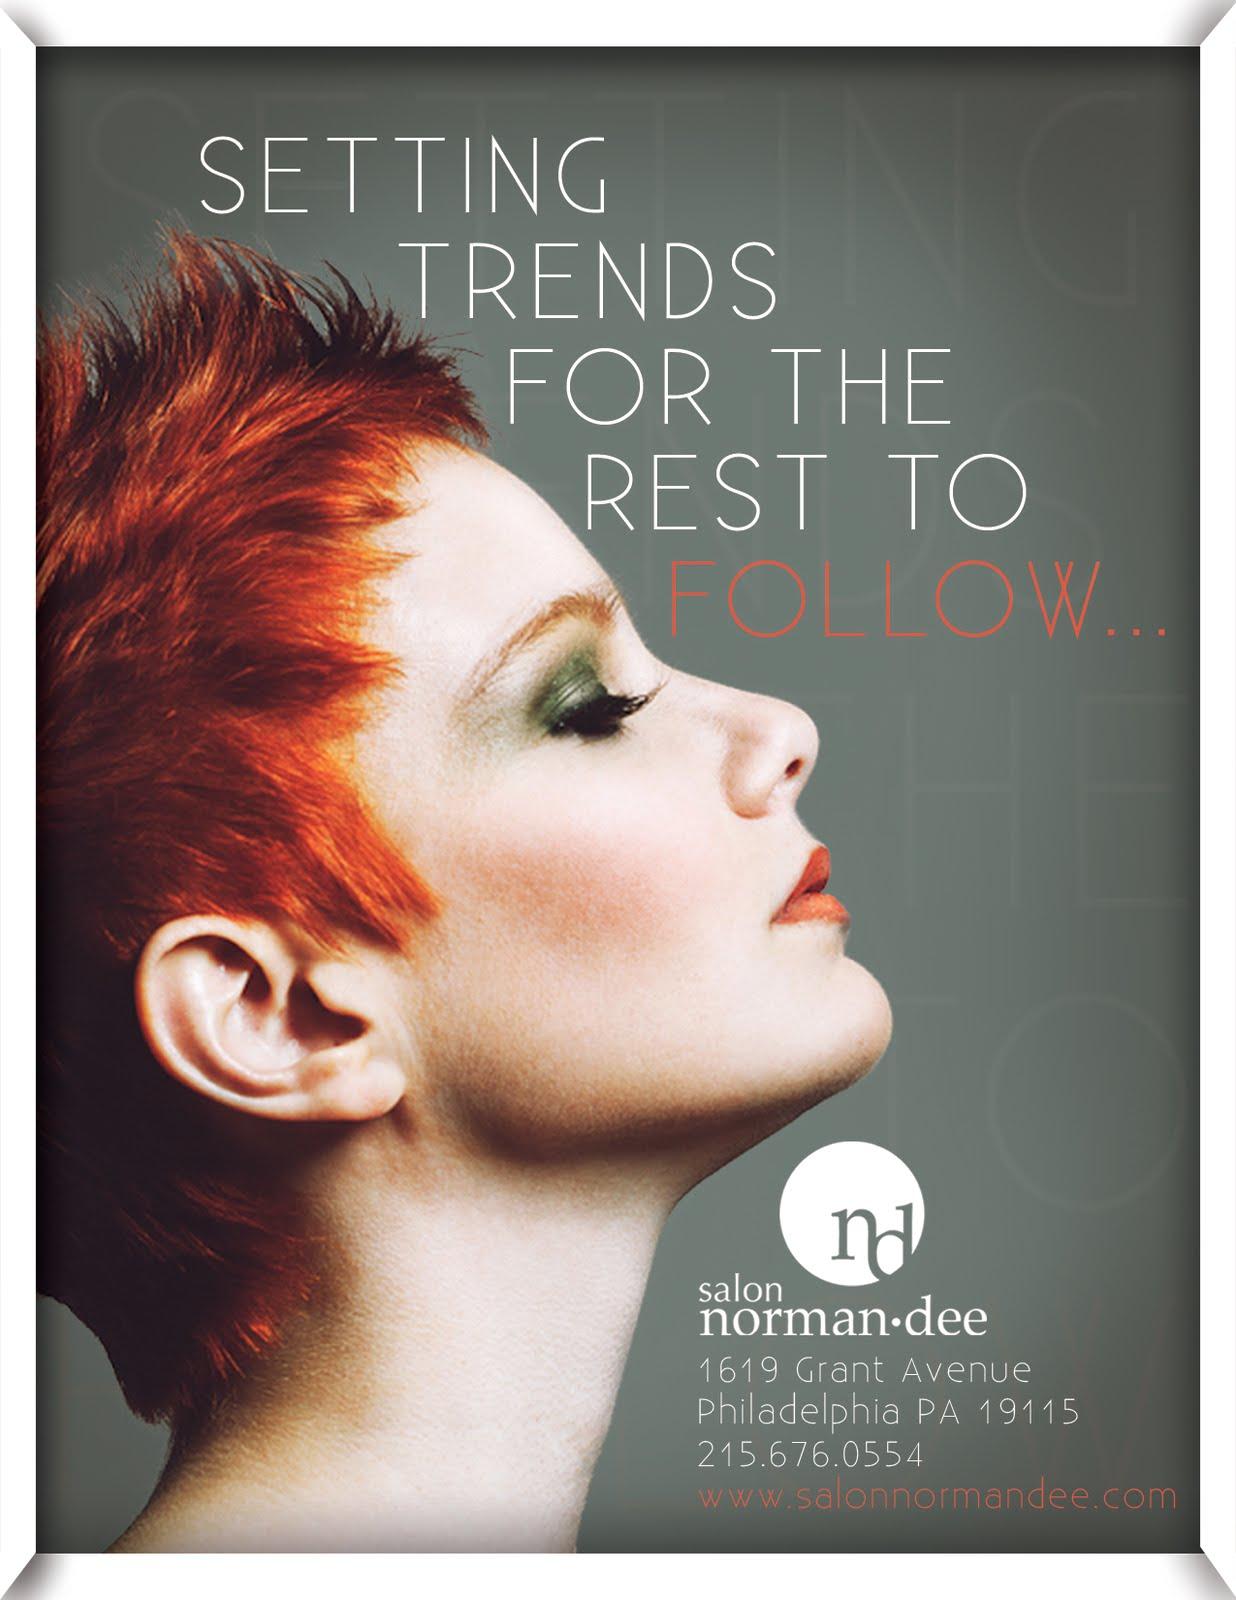 hair salon advertisement